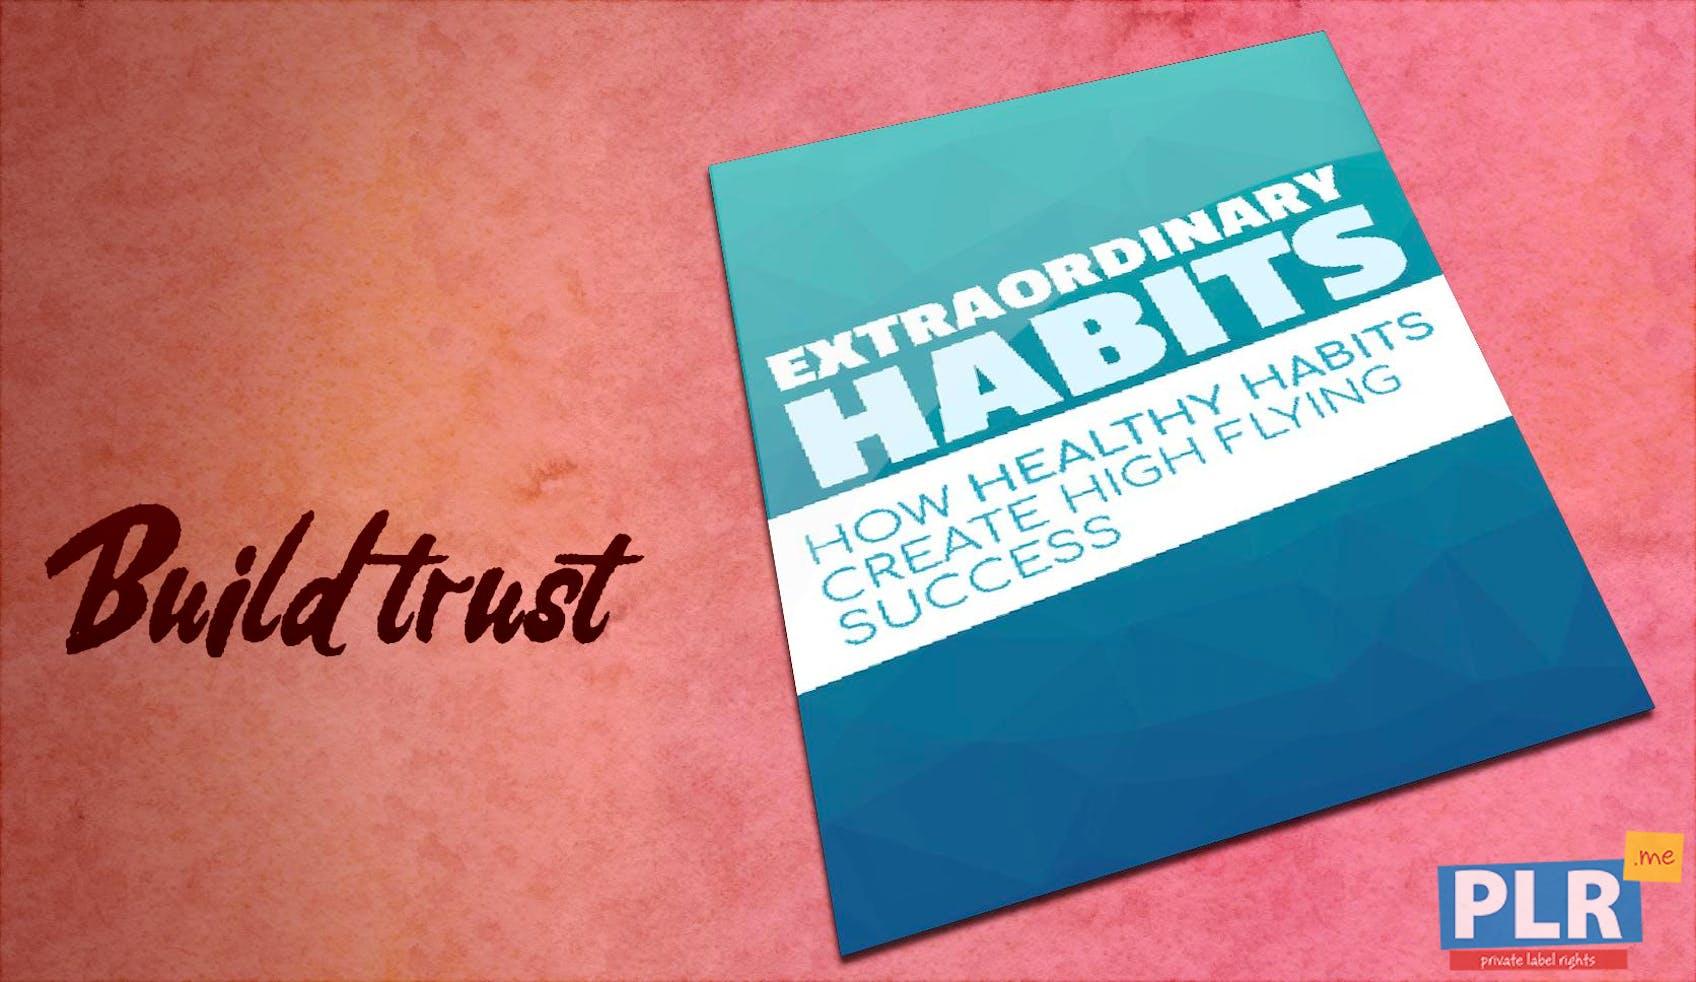 Extraordinary Habits How Healthy Habits Create High Flying Success